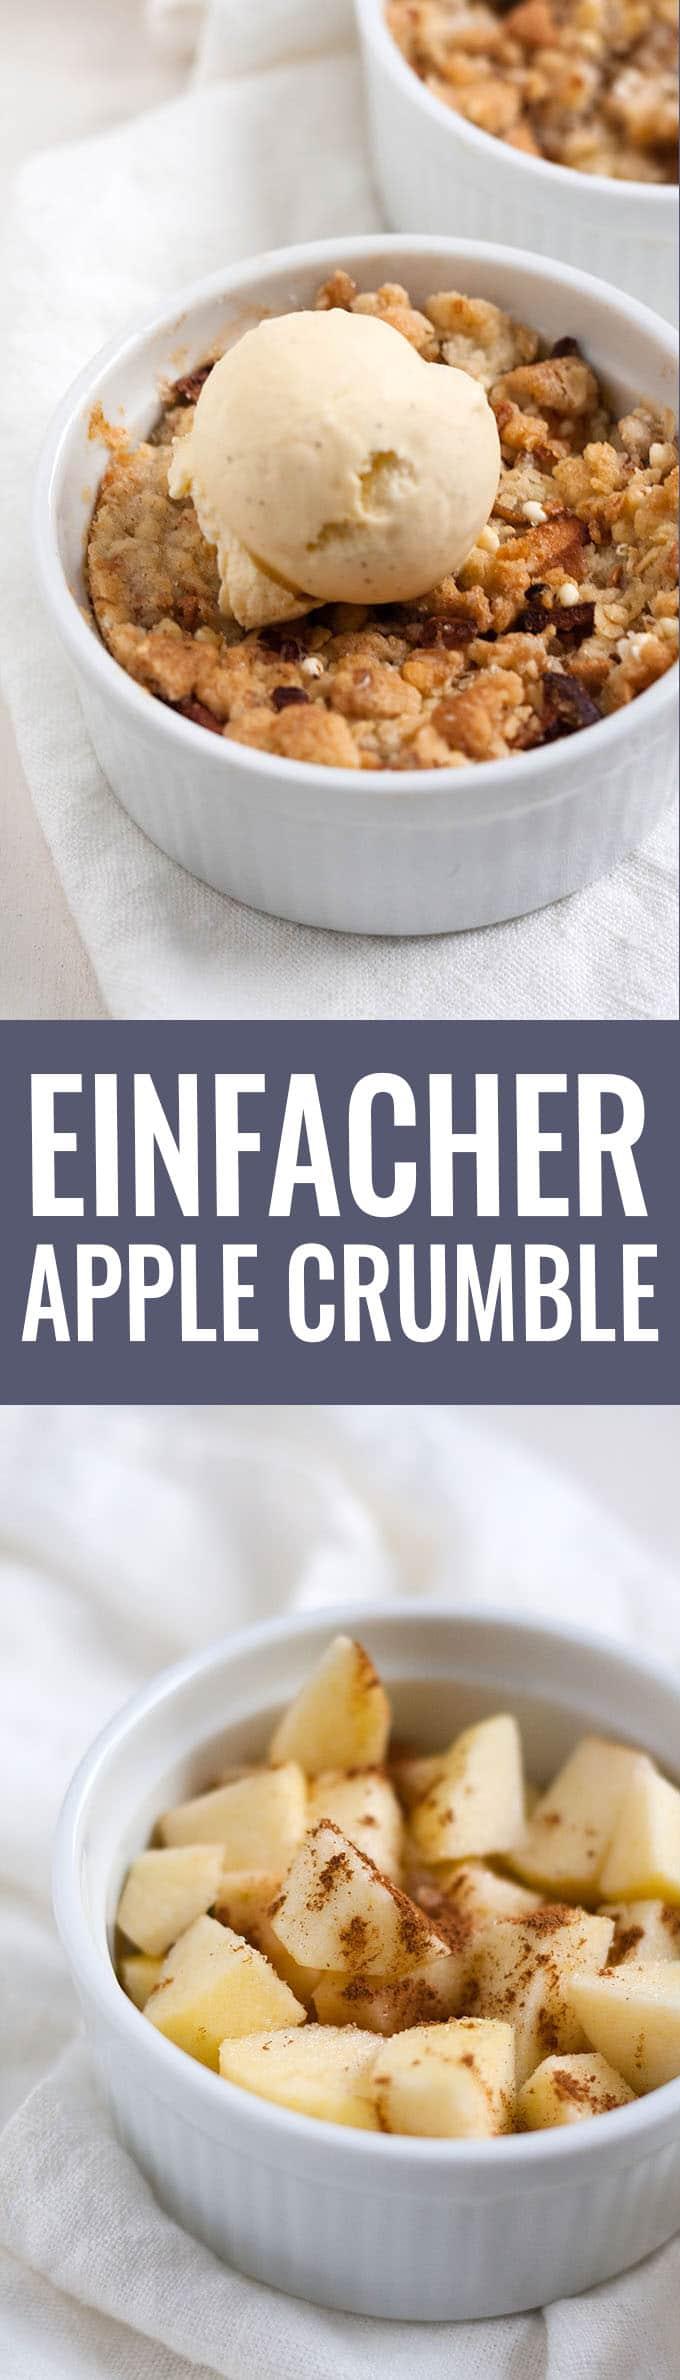 Einfacher Apple Crumble - Kochkarussell.com